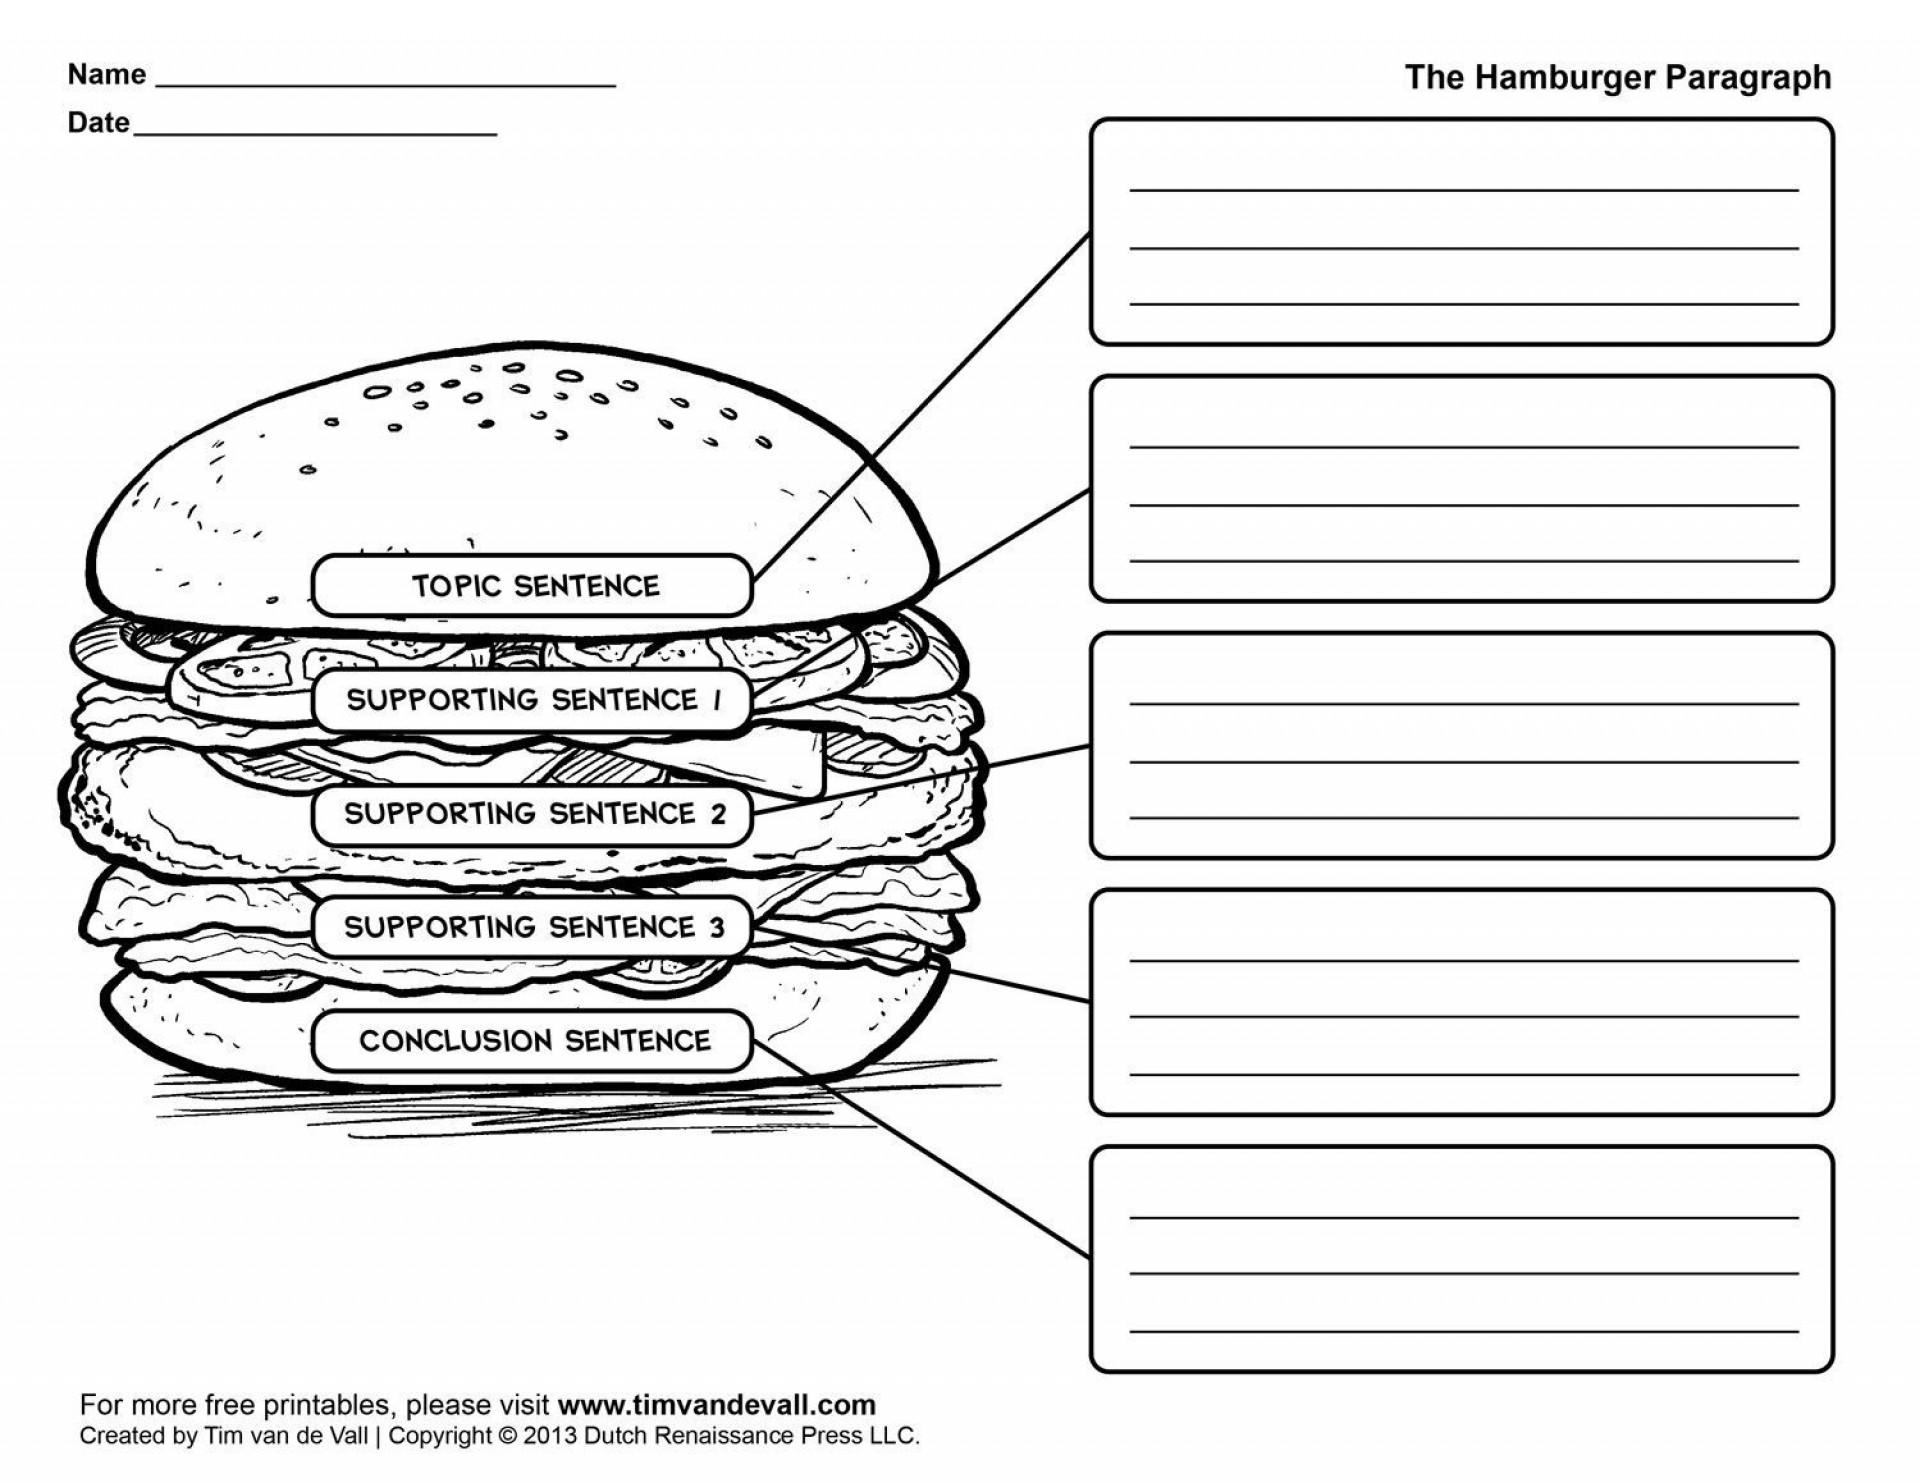 009 Essay Example Five Paragraph Graphic Wonderful Organizer 5 Middle School Pdf Organizer-hamburger 1920